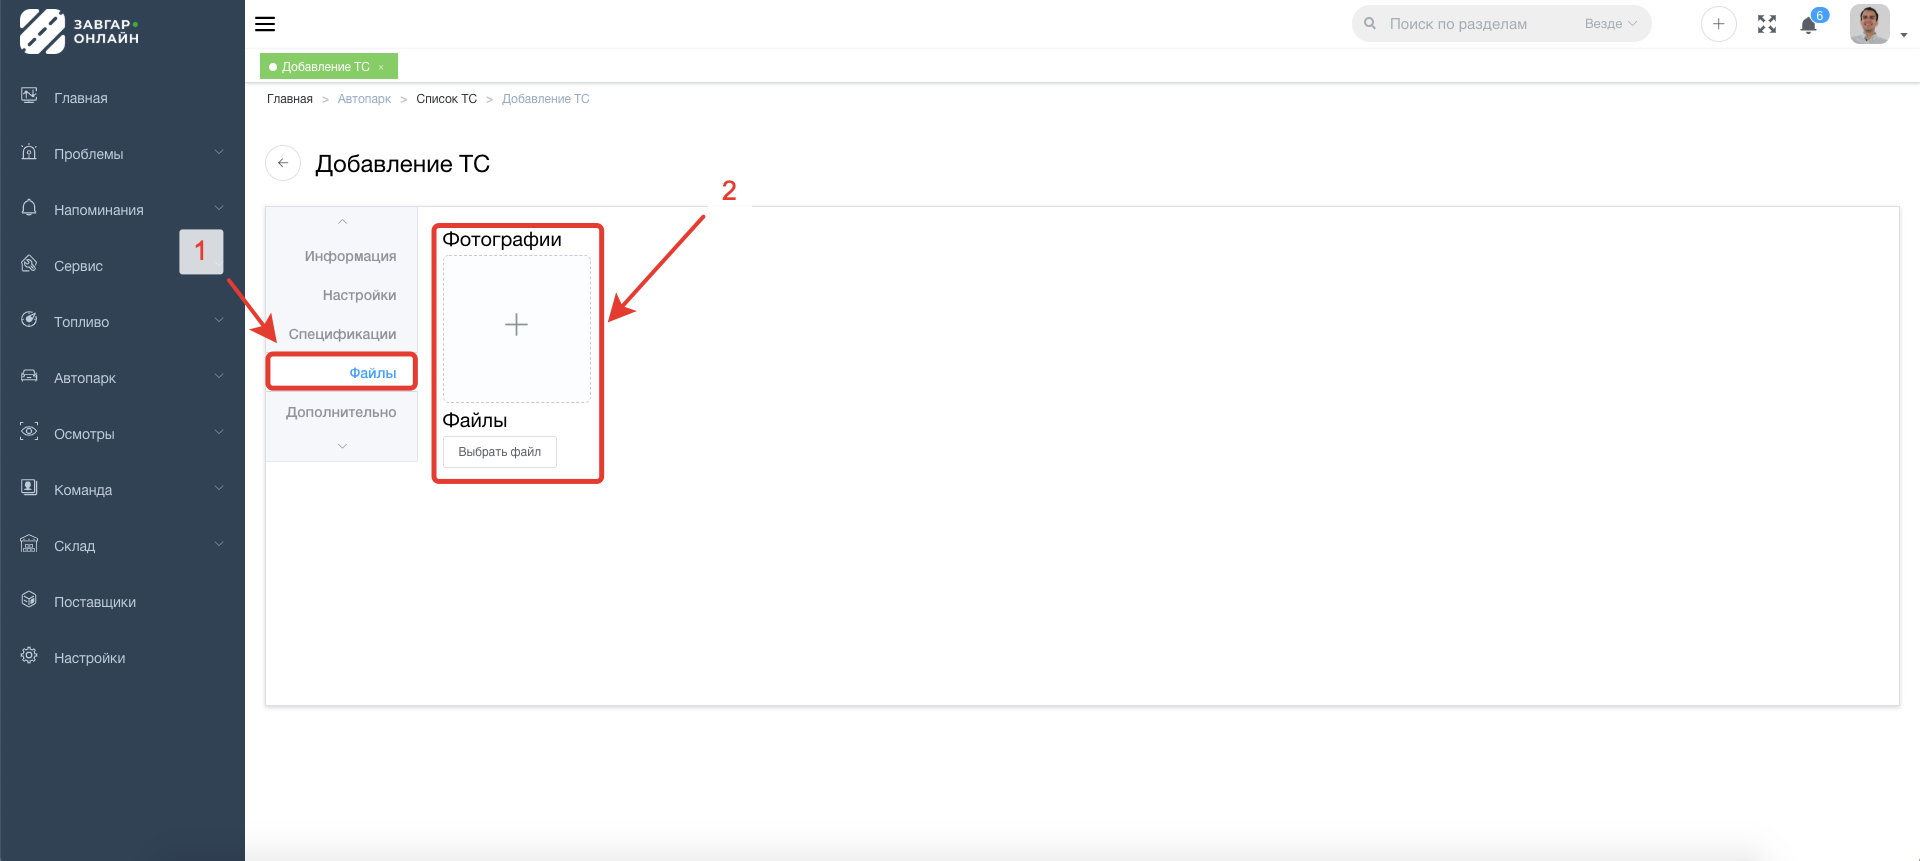 "Добавление файлов вкладка ""Файлы"" система Завгар Онлайн"